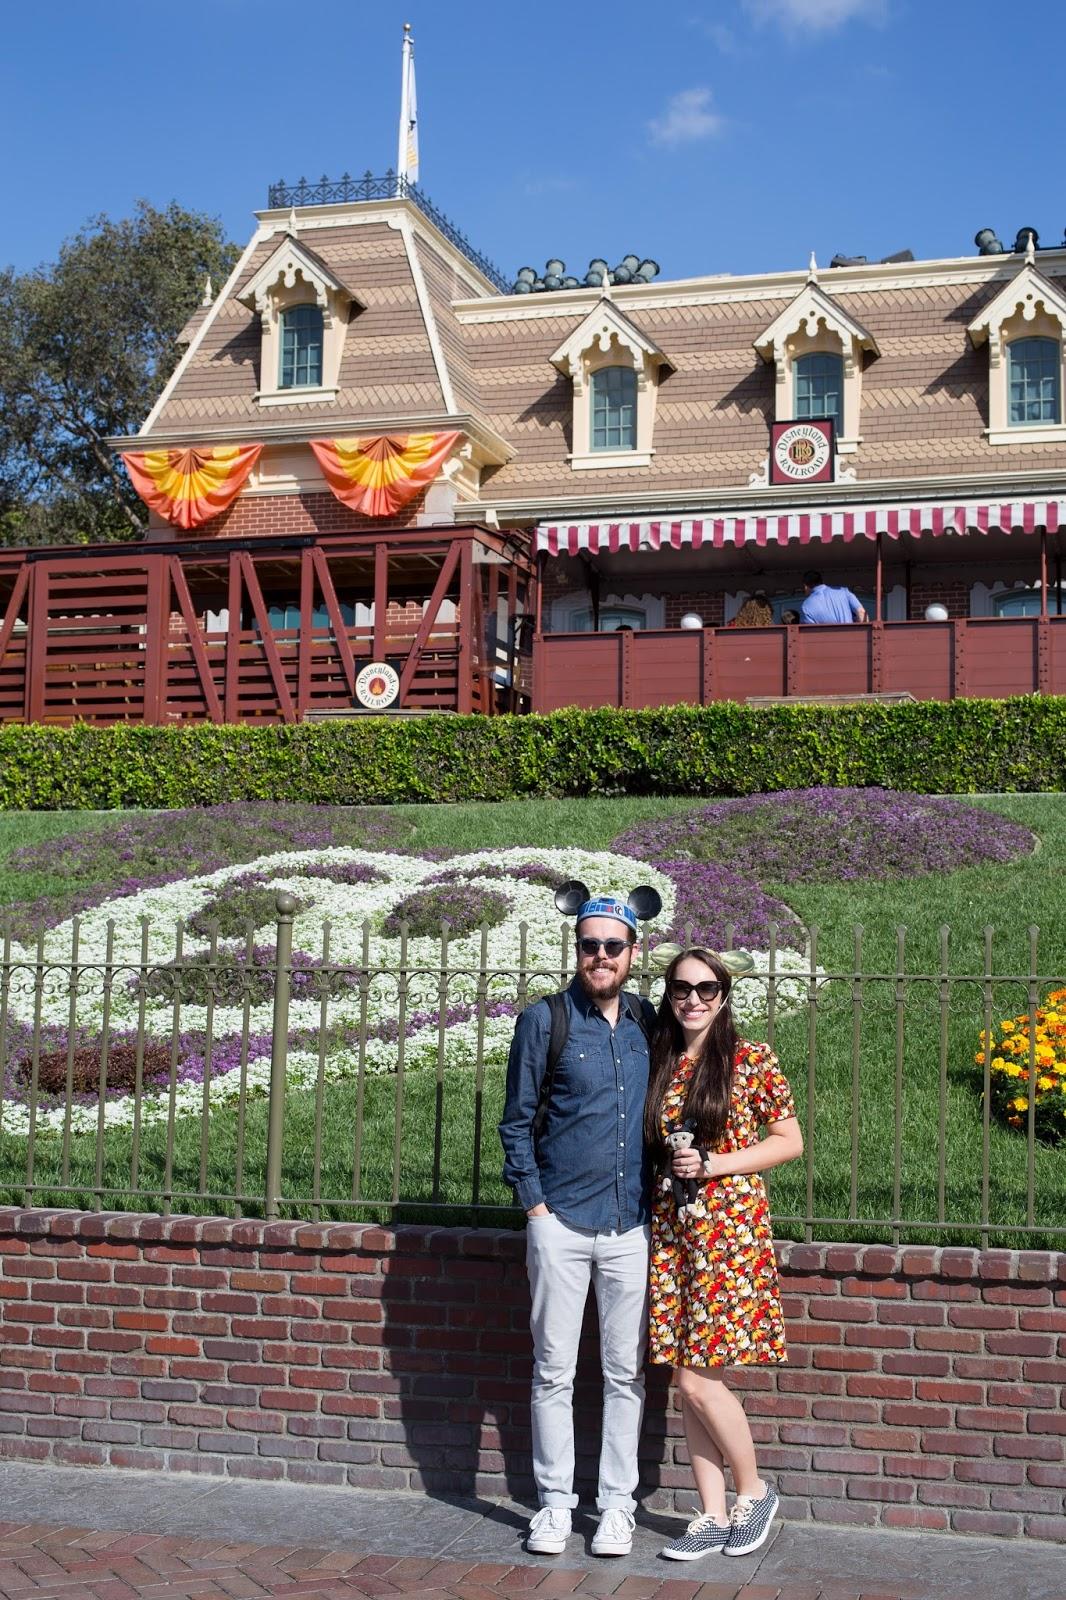 Disneyland Mickey Front Entrance